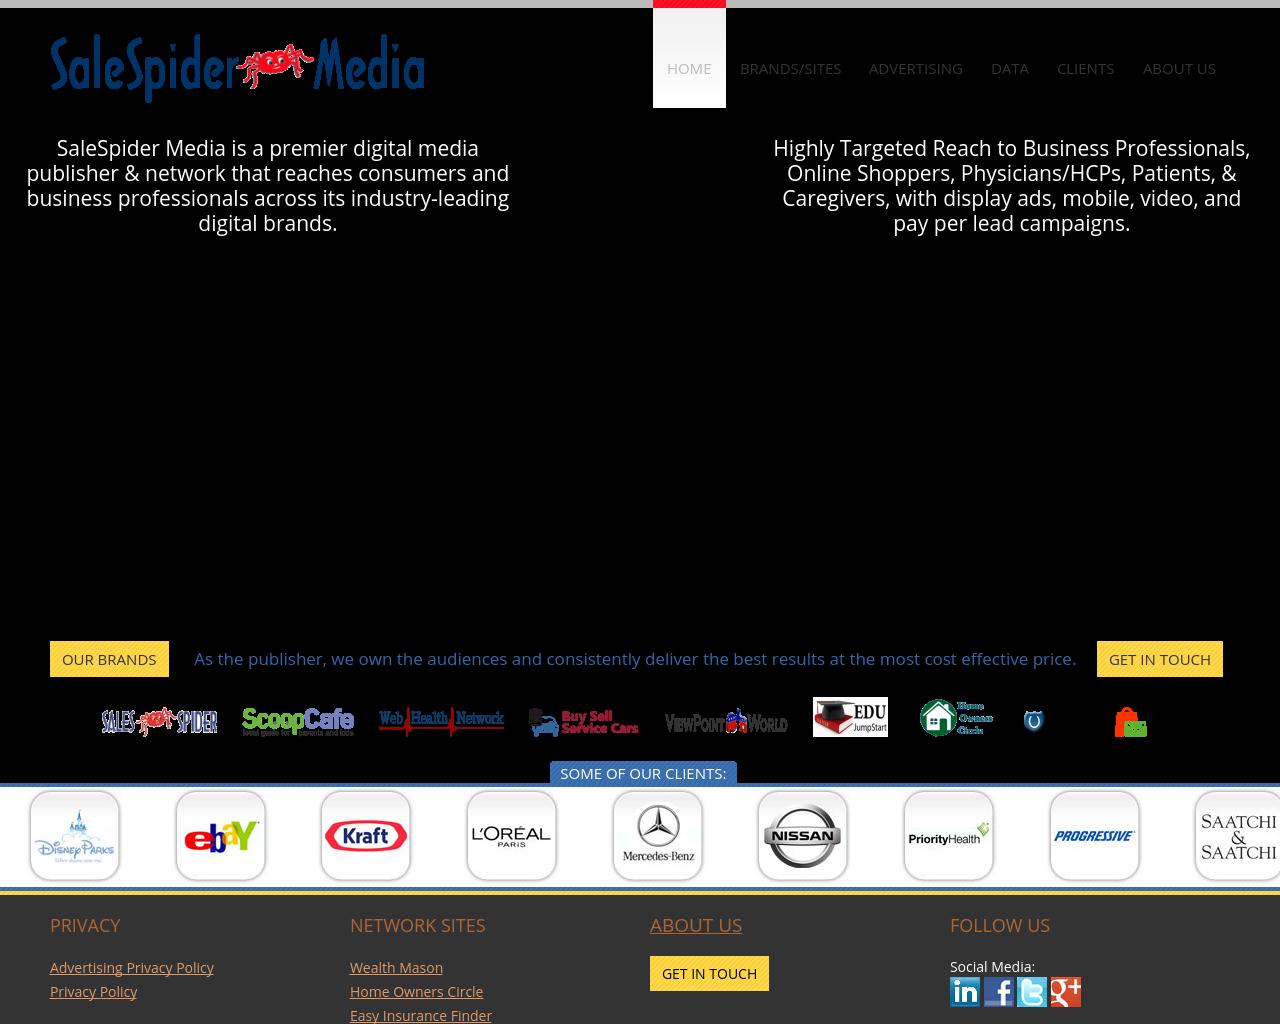 SaleSpider-Media-Advertising-Reviews-Pricing